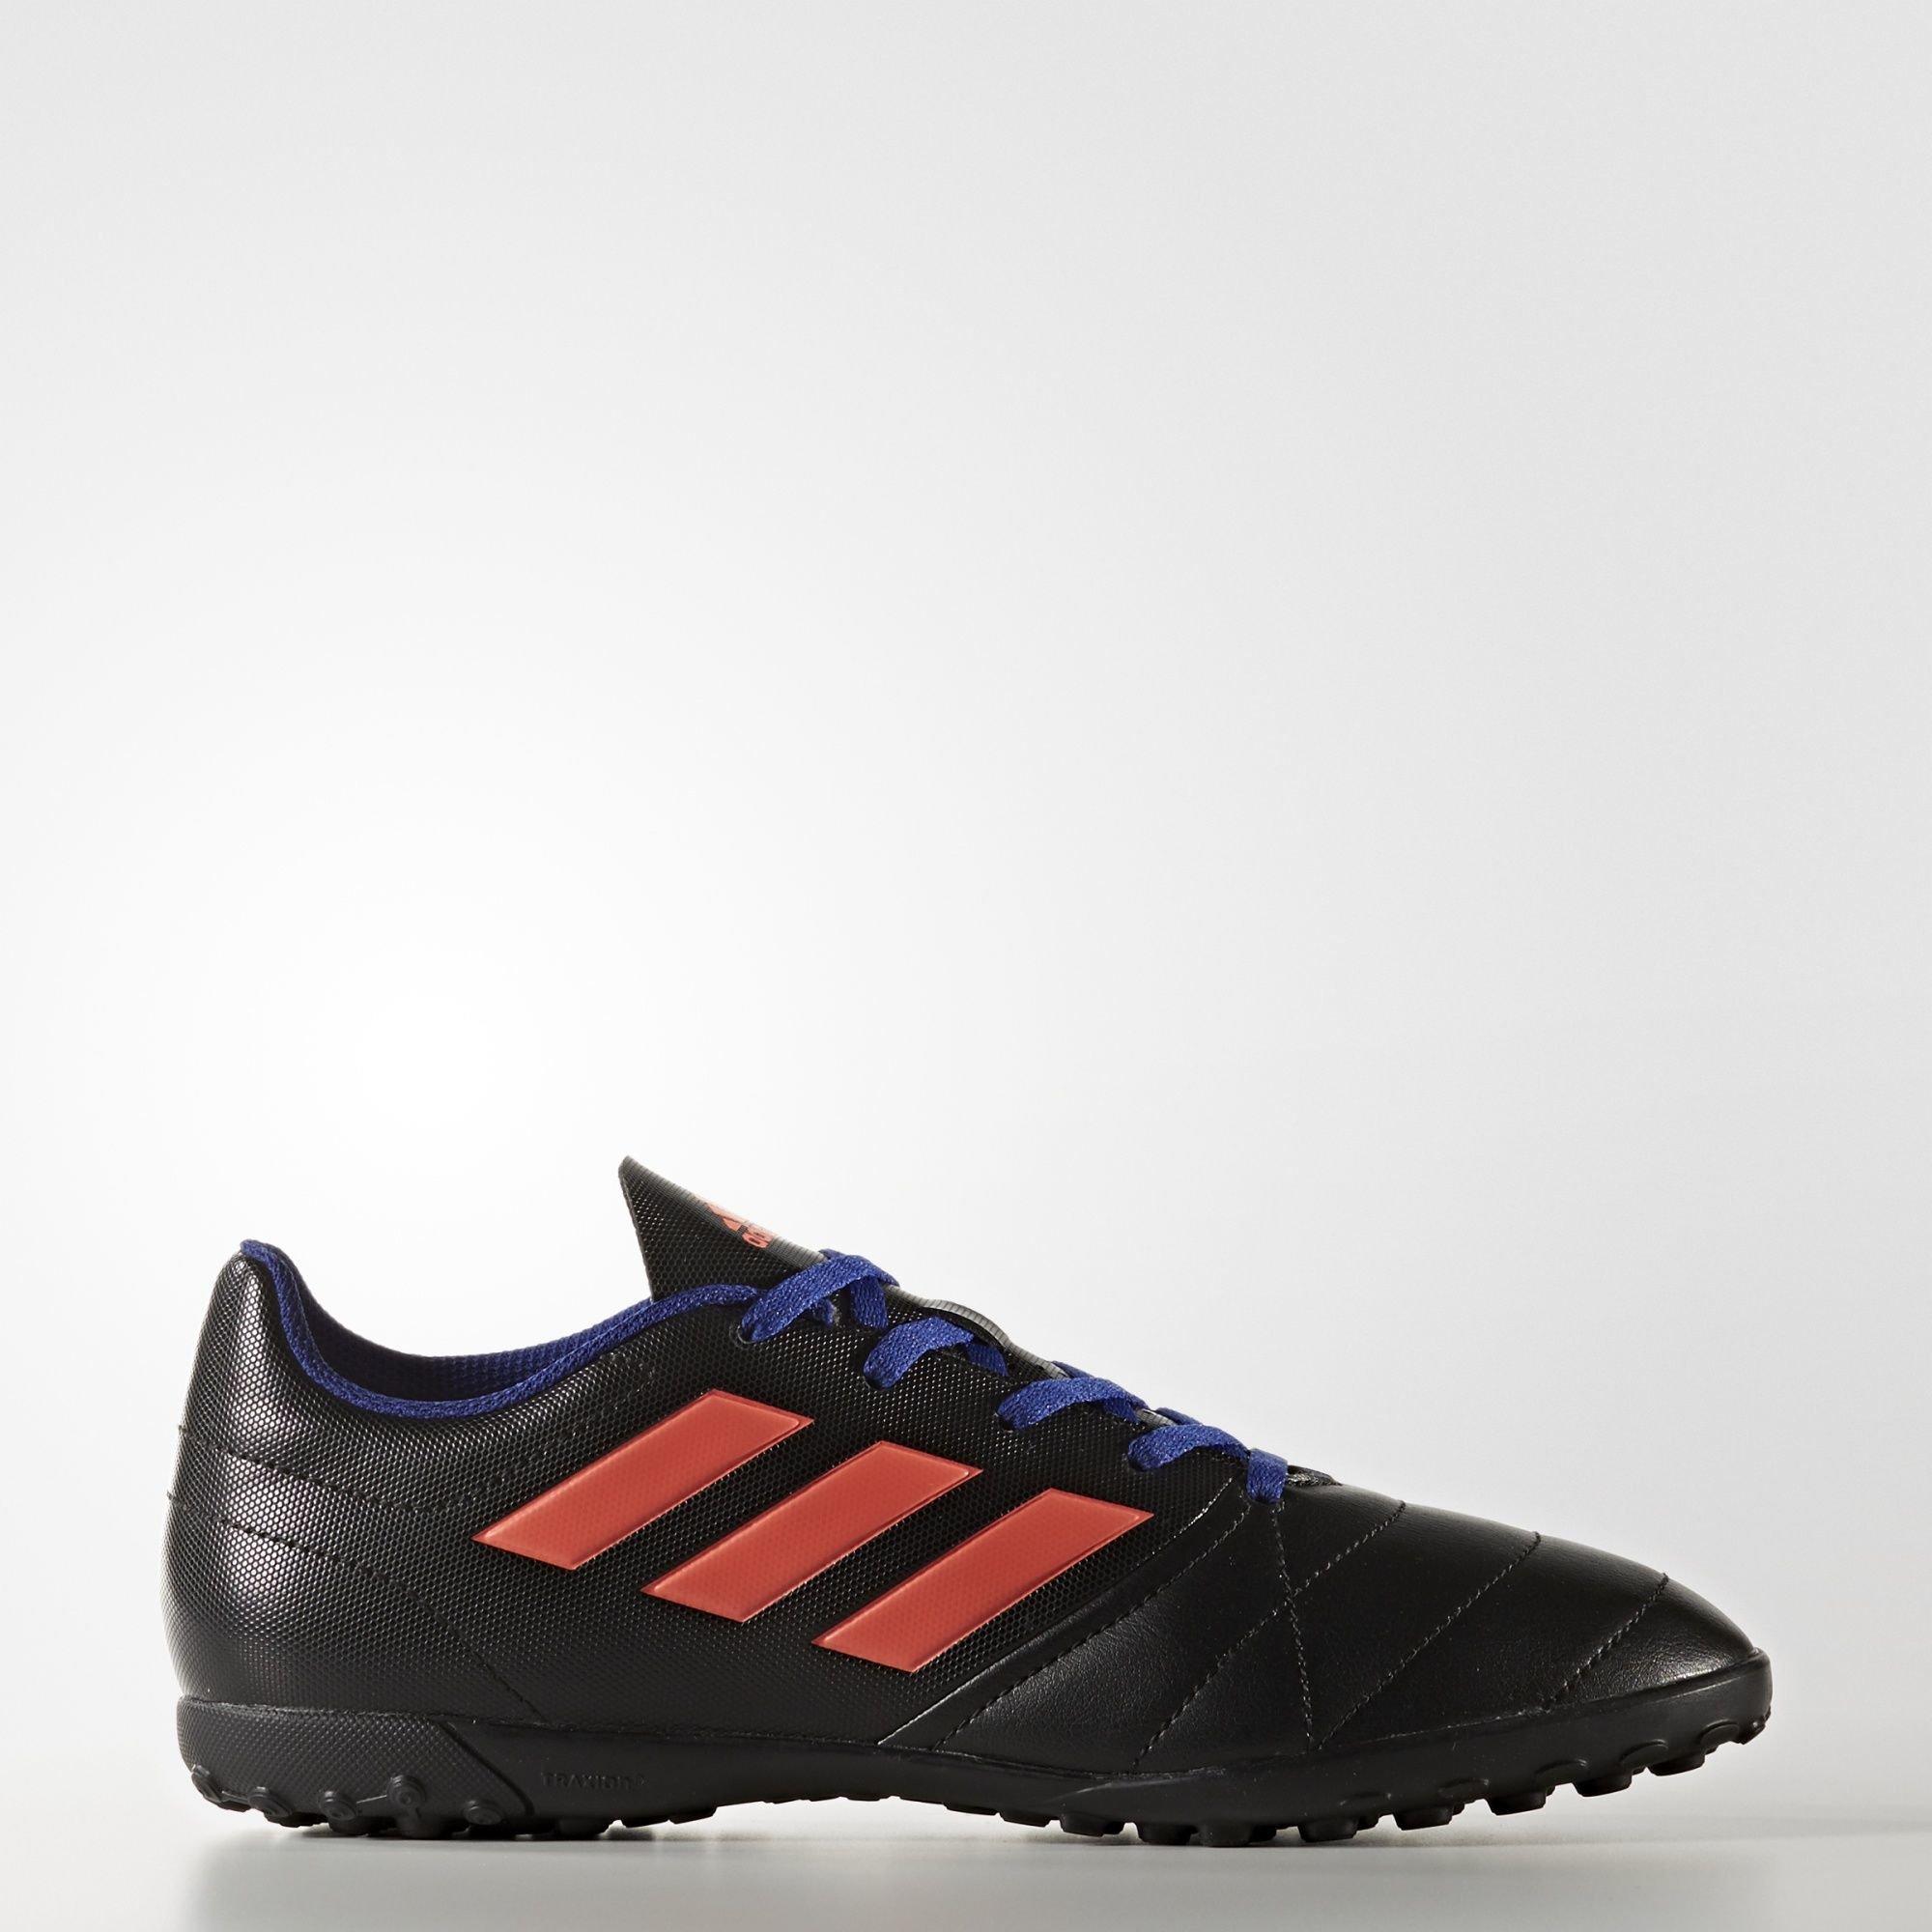 Футбольные бутсы ACE 17.4 TF adidas Performance core black / easy coral s17 / mystery ink f17